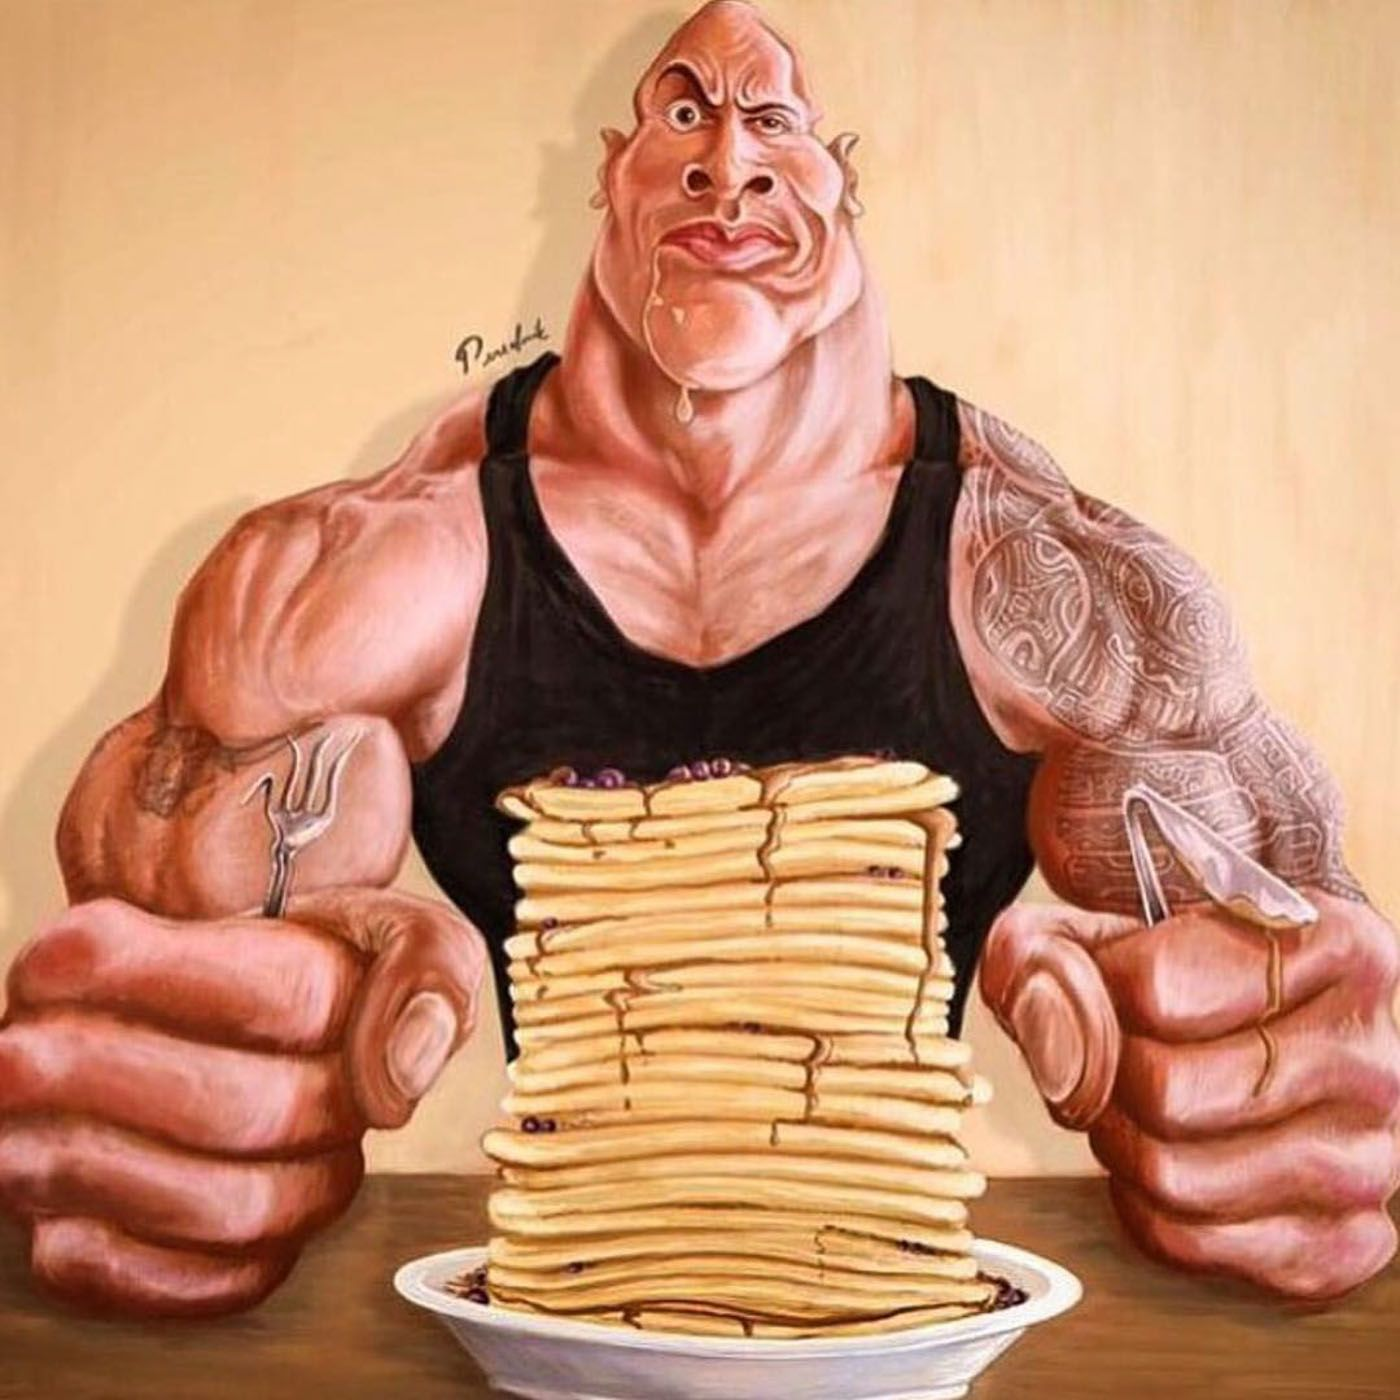 Dwayne 'The Rock' Johnson's Pancake Cheat Meals